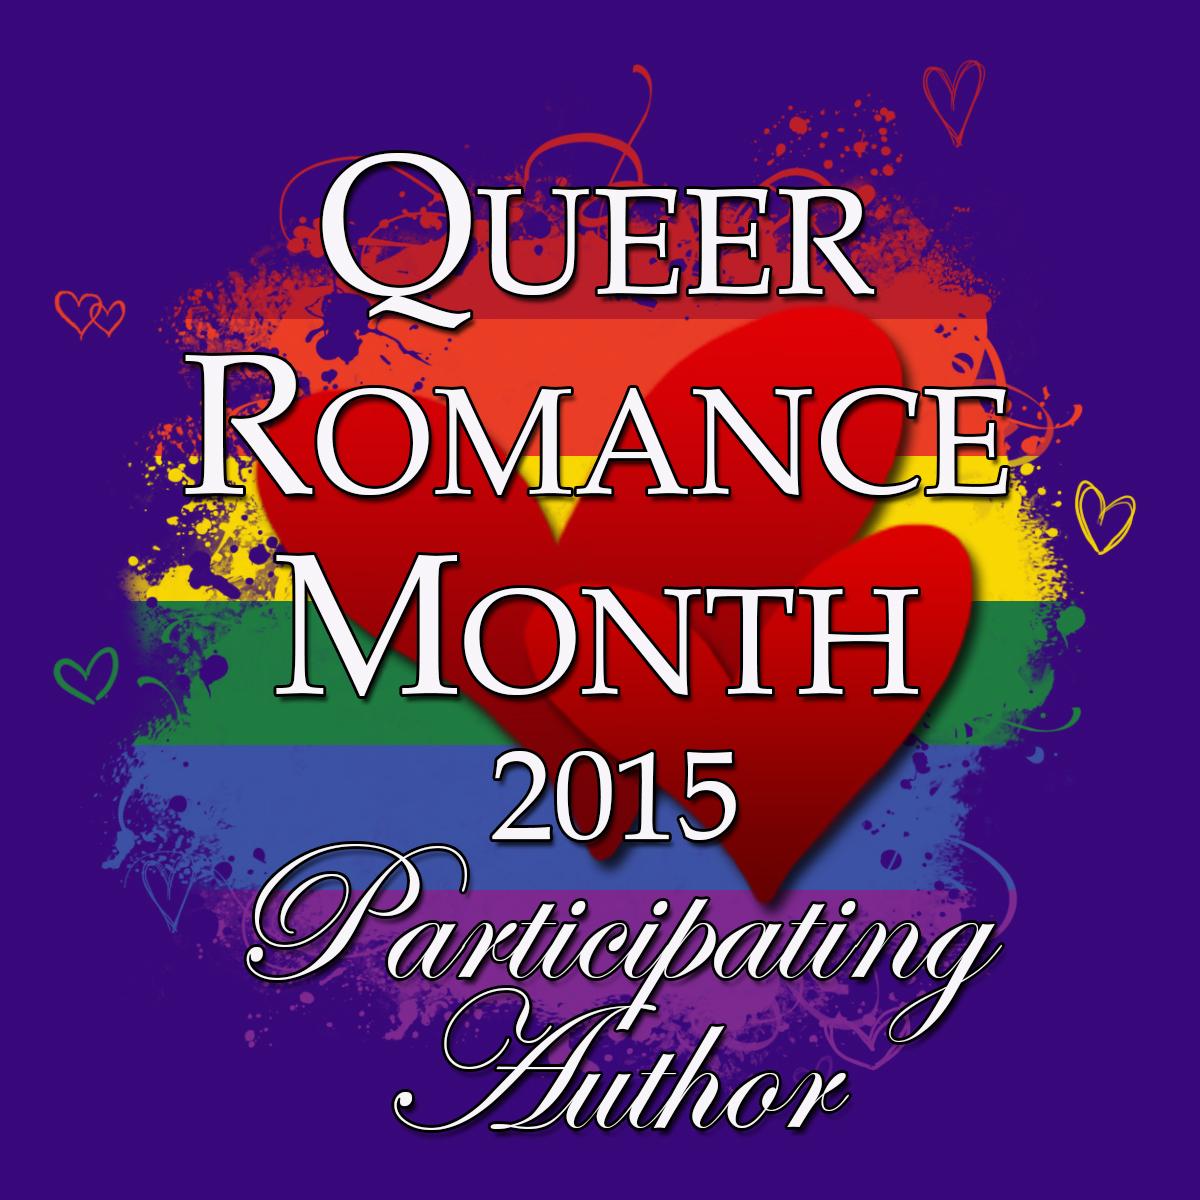 Queer Romance Month - Participating Author